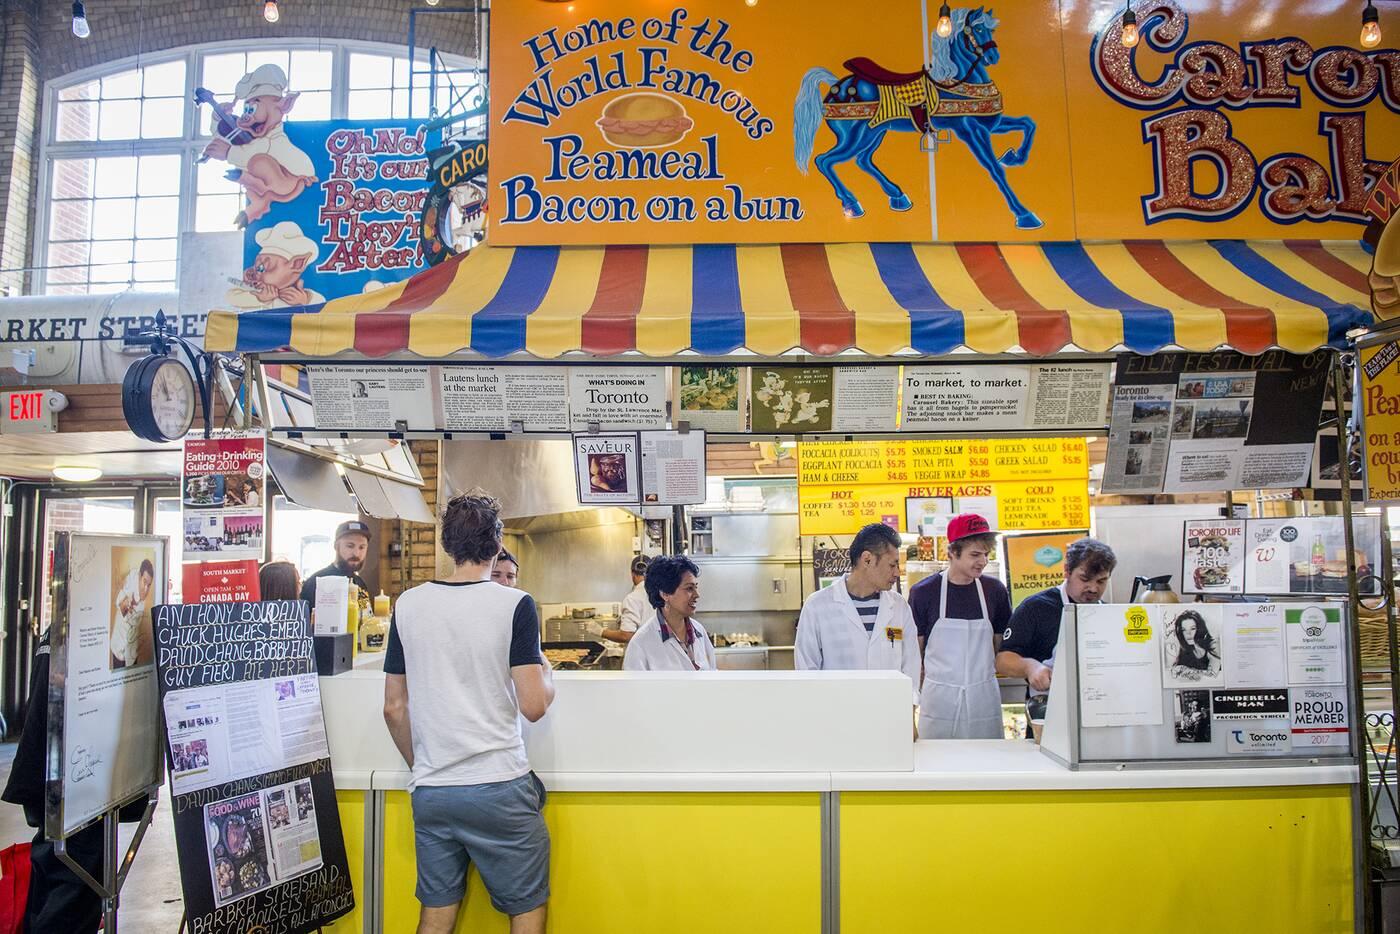 Carousel Bakery Toronto